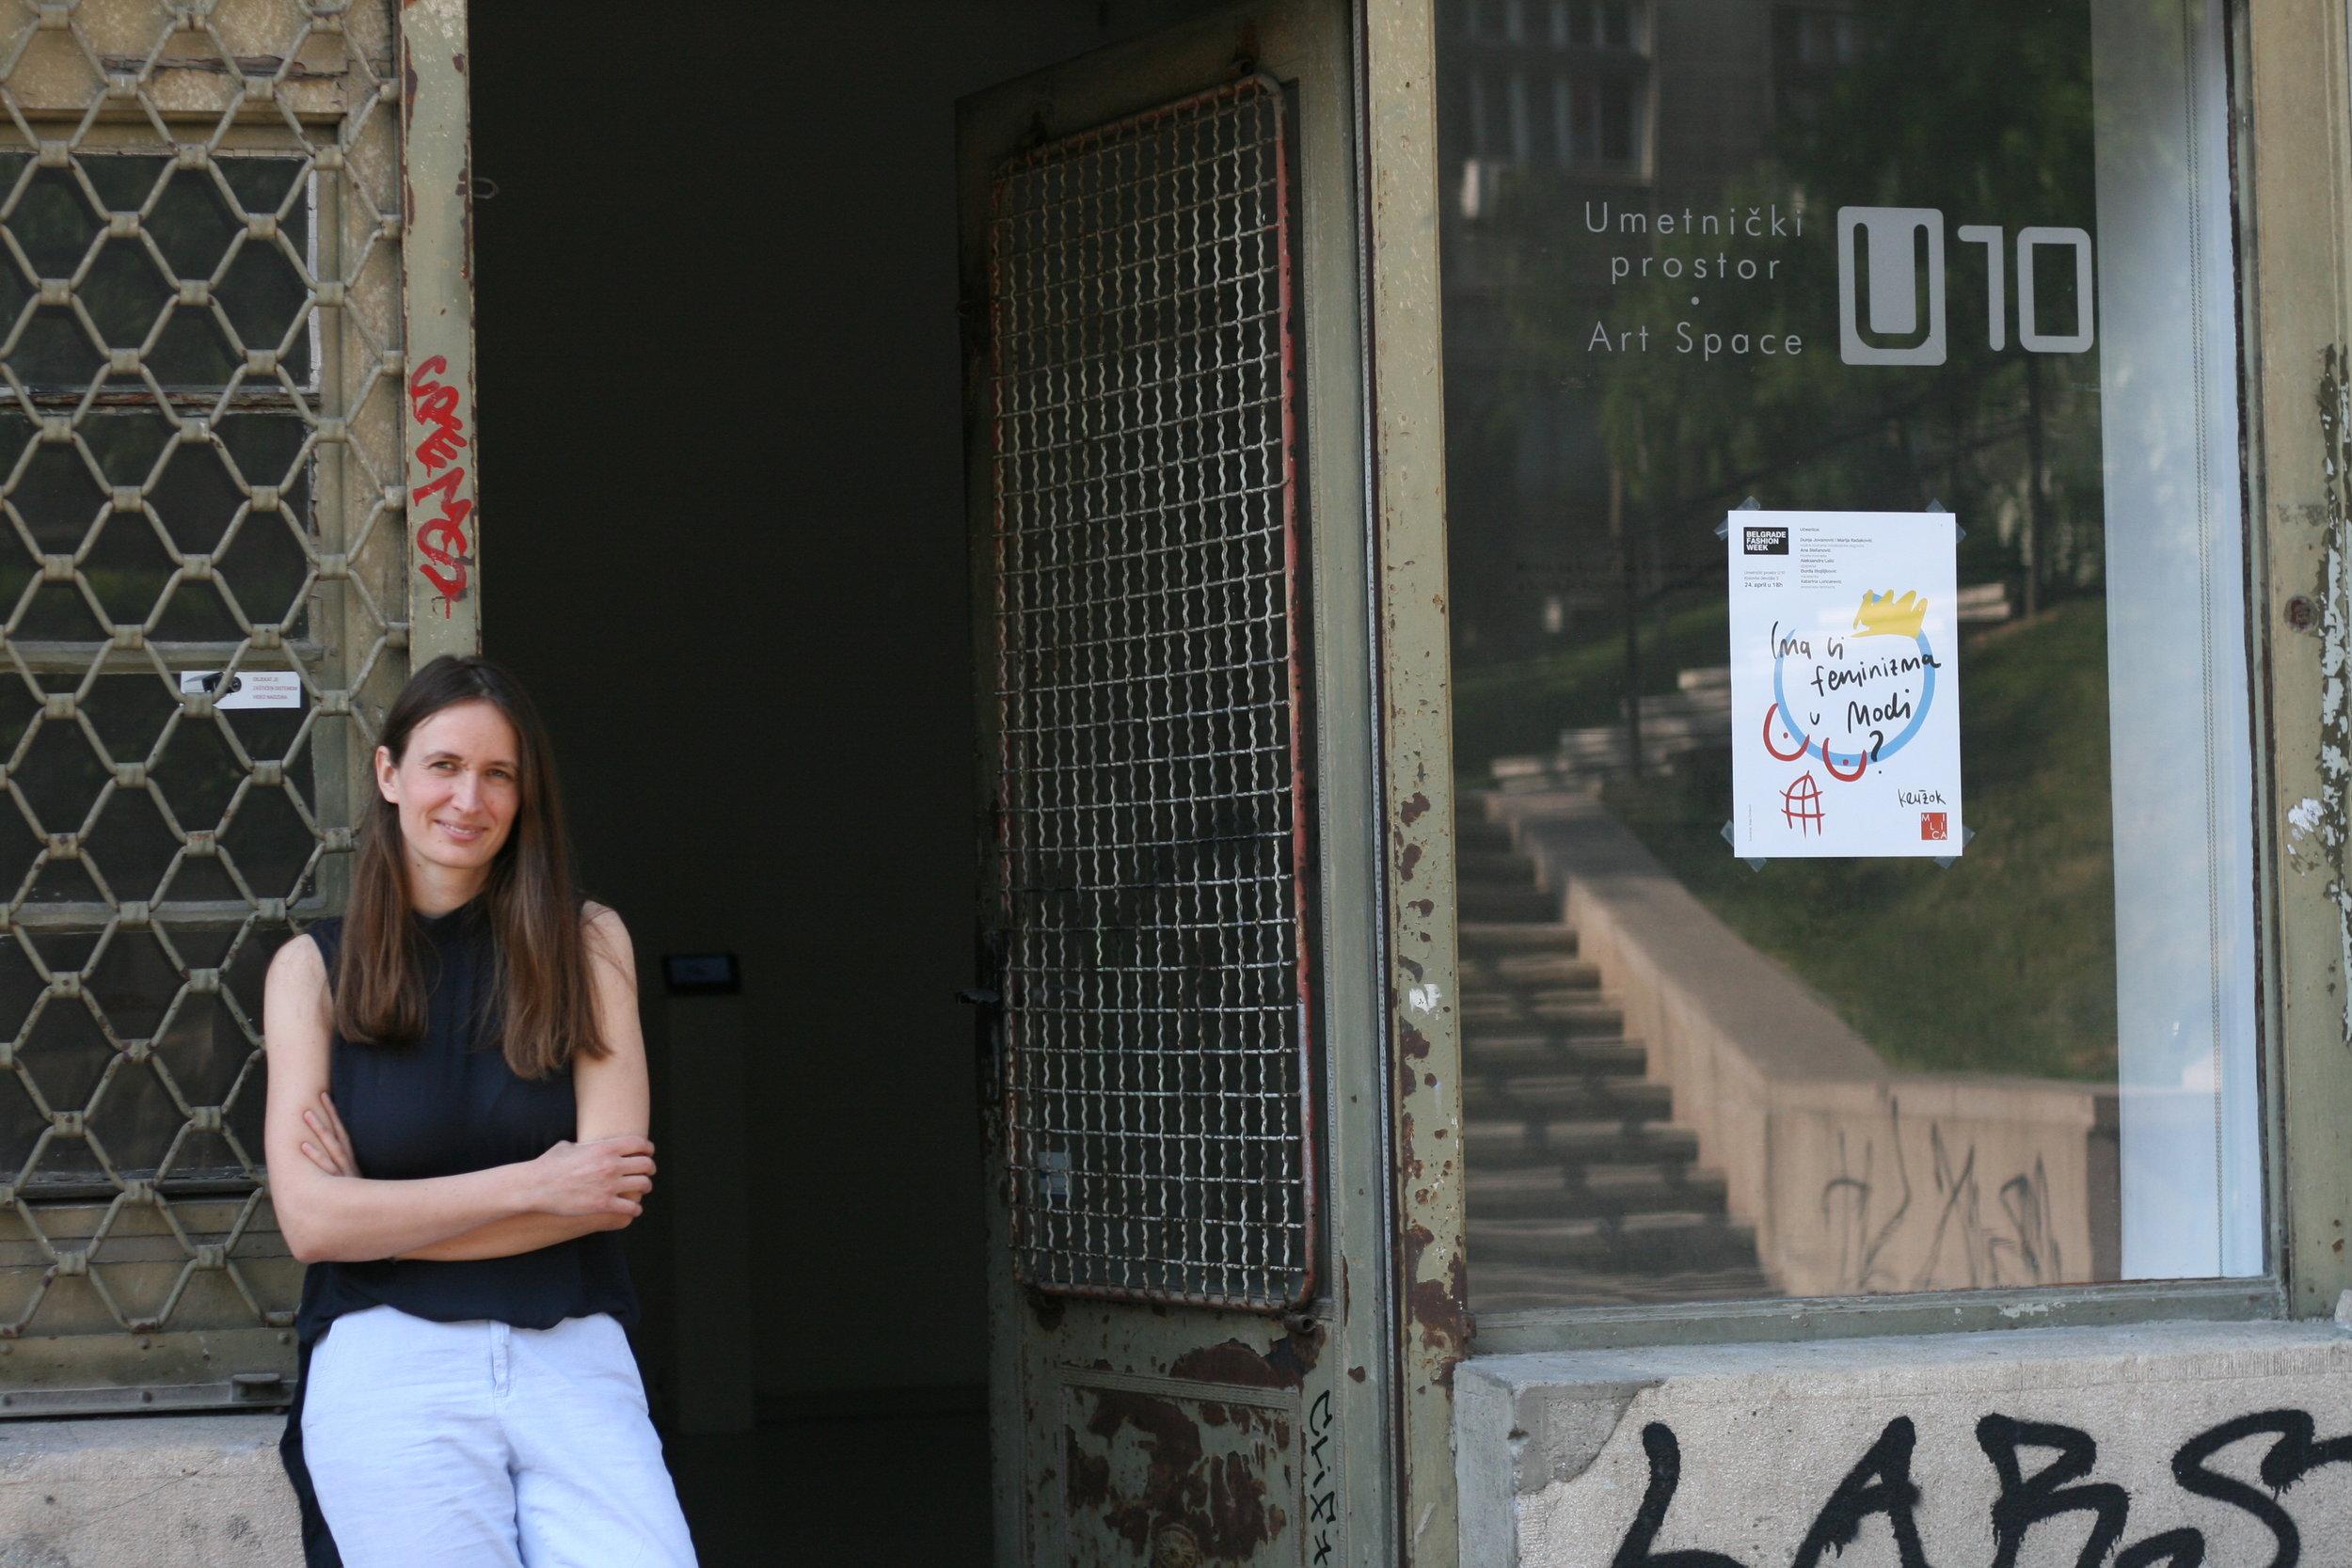 Nina Ivanovic